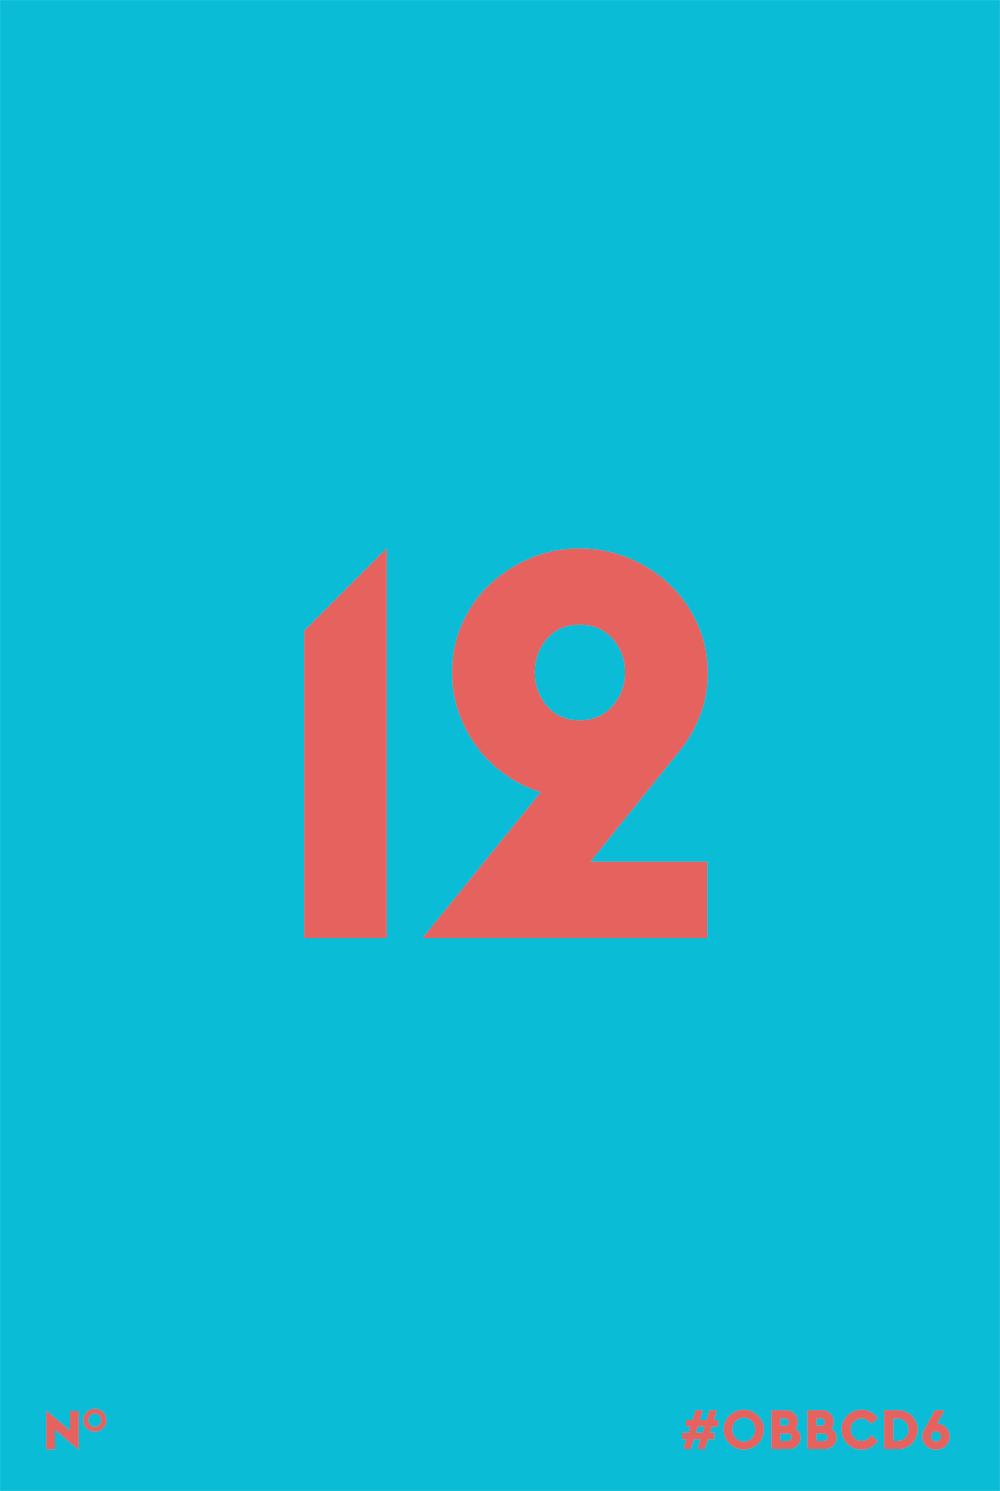 cc_0011_12